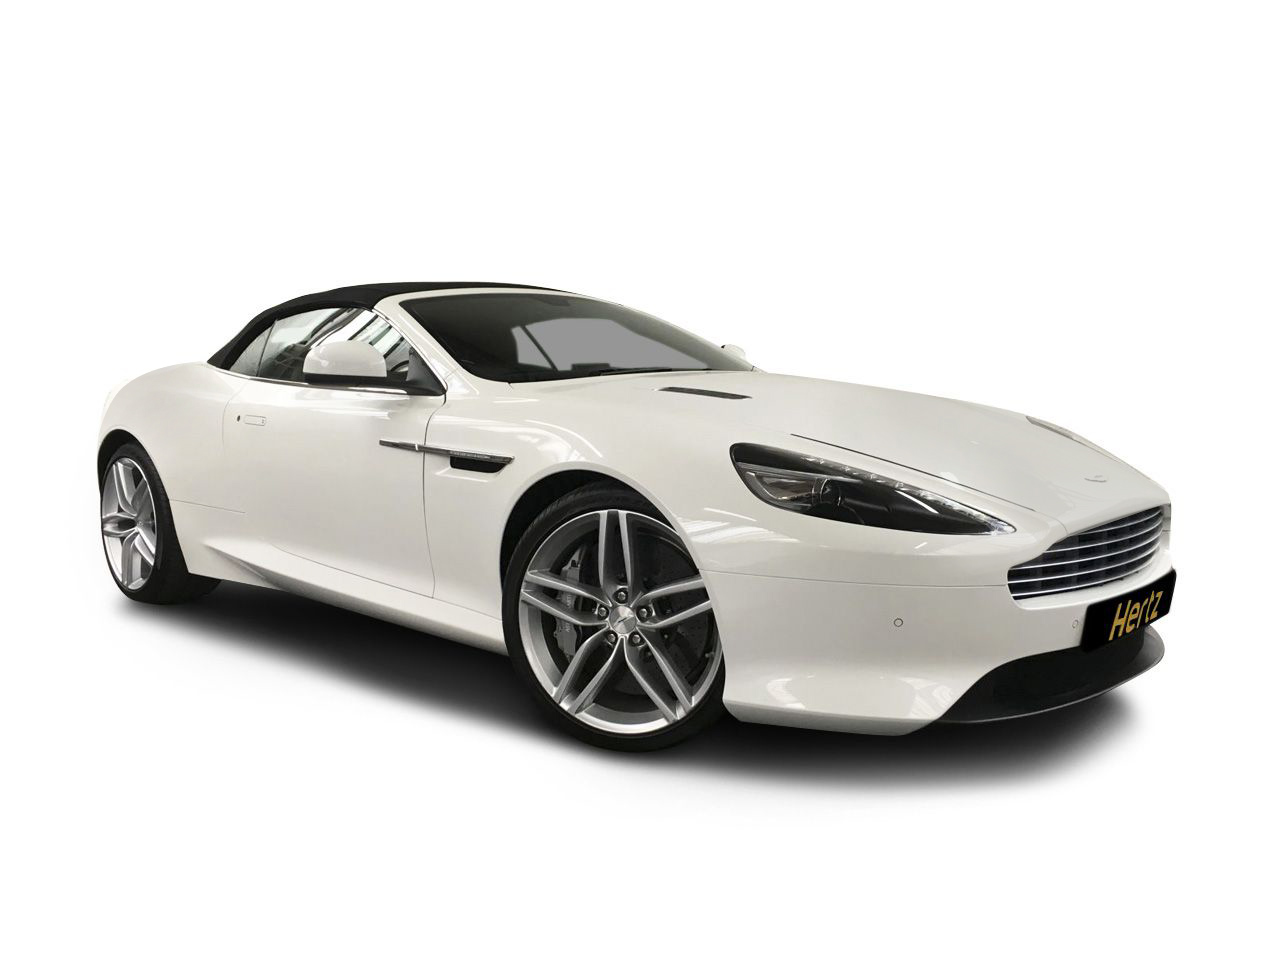 Aston Martin DB Car Hire In London UK Aston Martin DB Rental - Aston martin db9 car